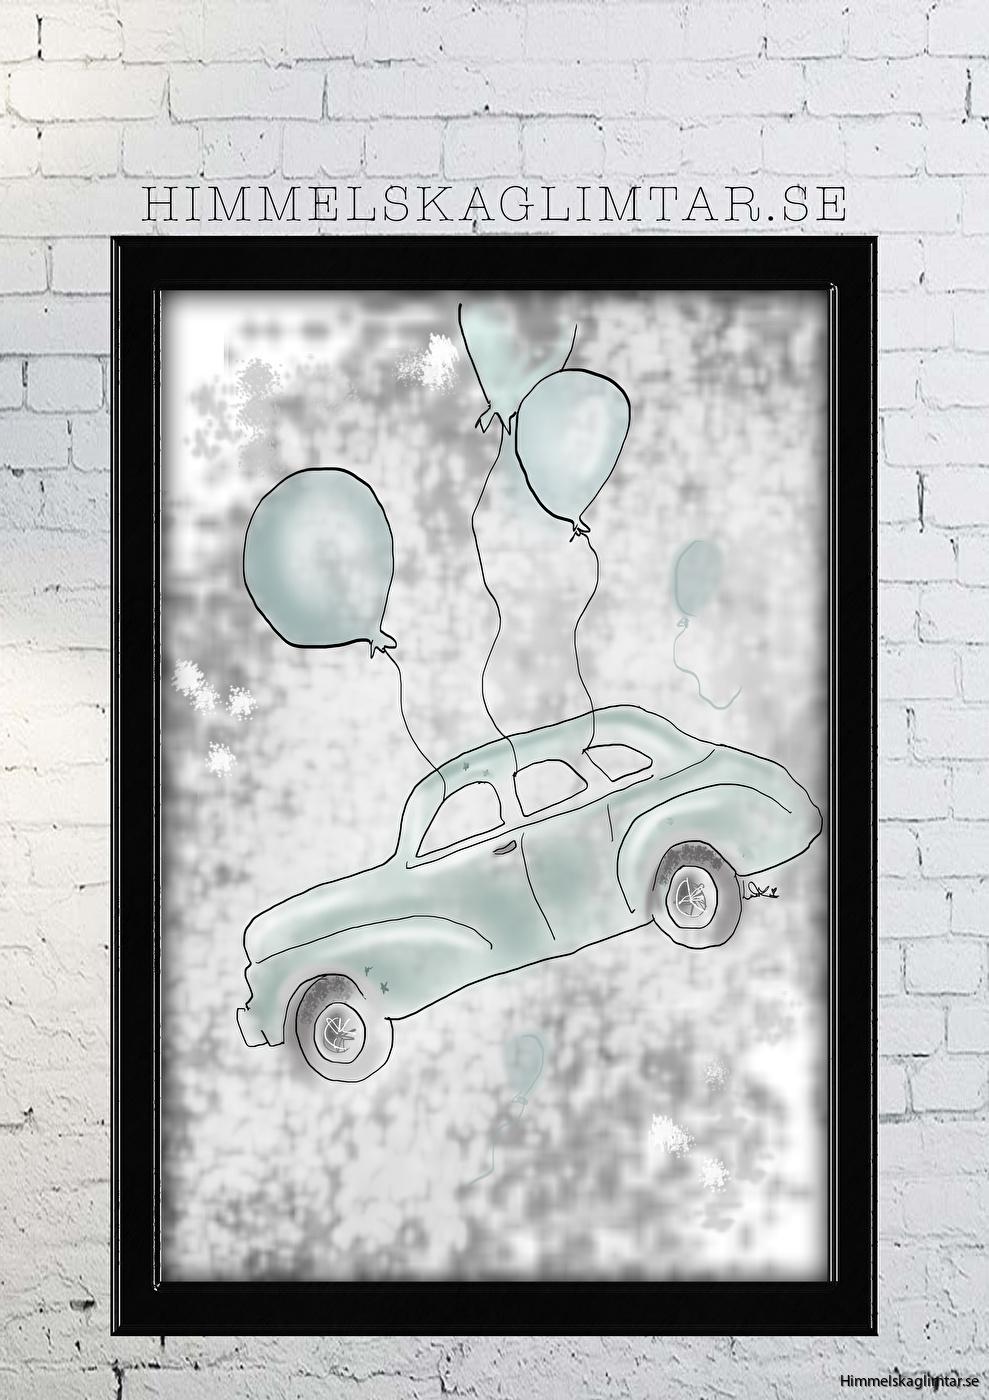 barnrum-barnrumsinredning-barnposter-poster-himmelskaglimtar-bil-pojkrum